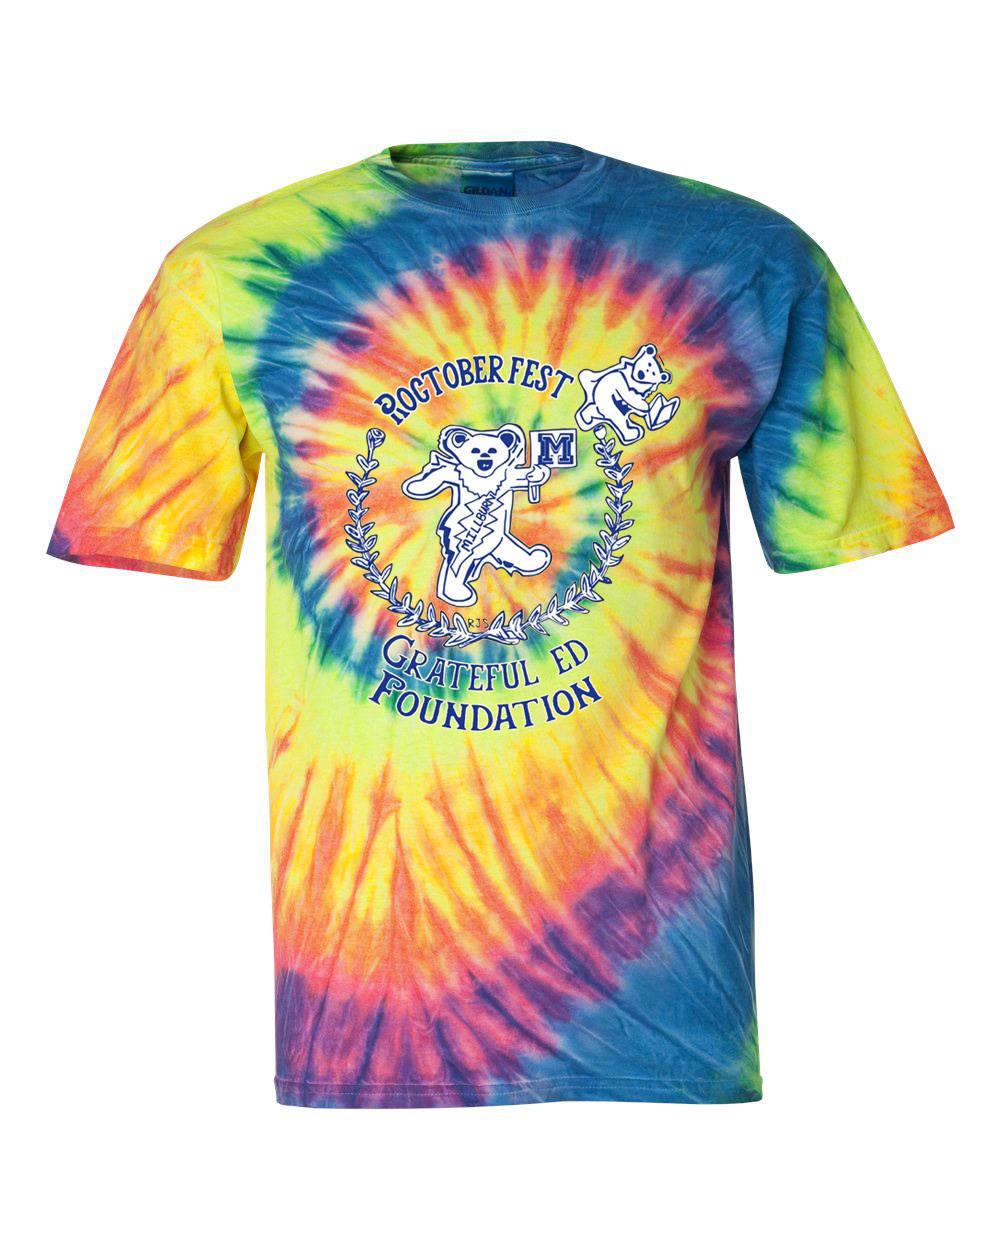 3af7240d69d579fed749_Rocktoberfest_tee_shirt.jpg